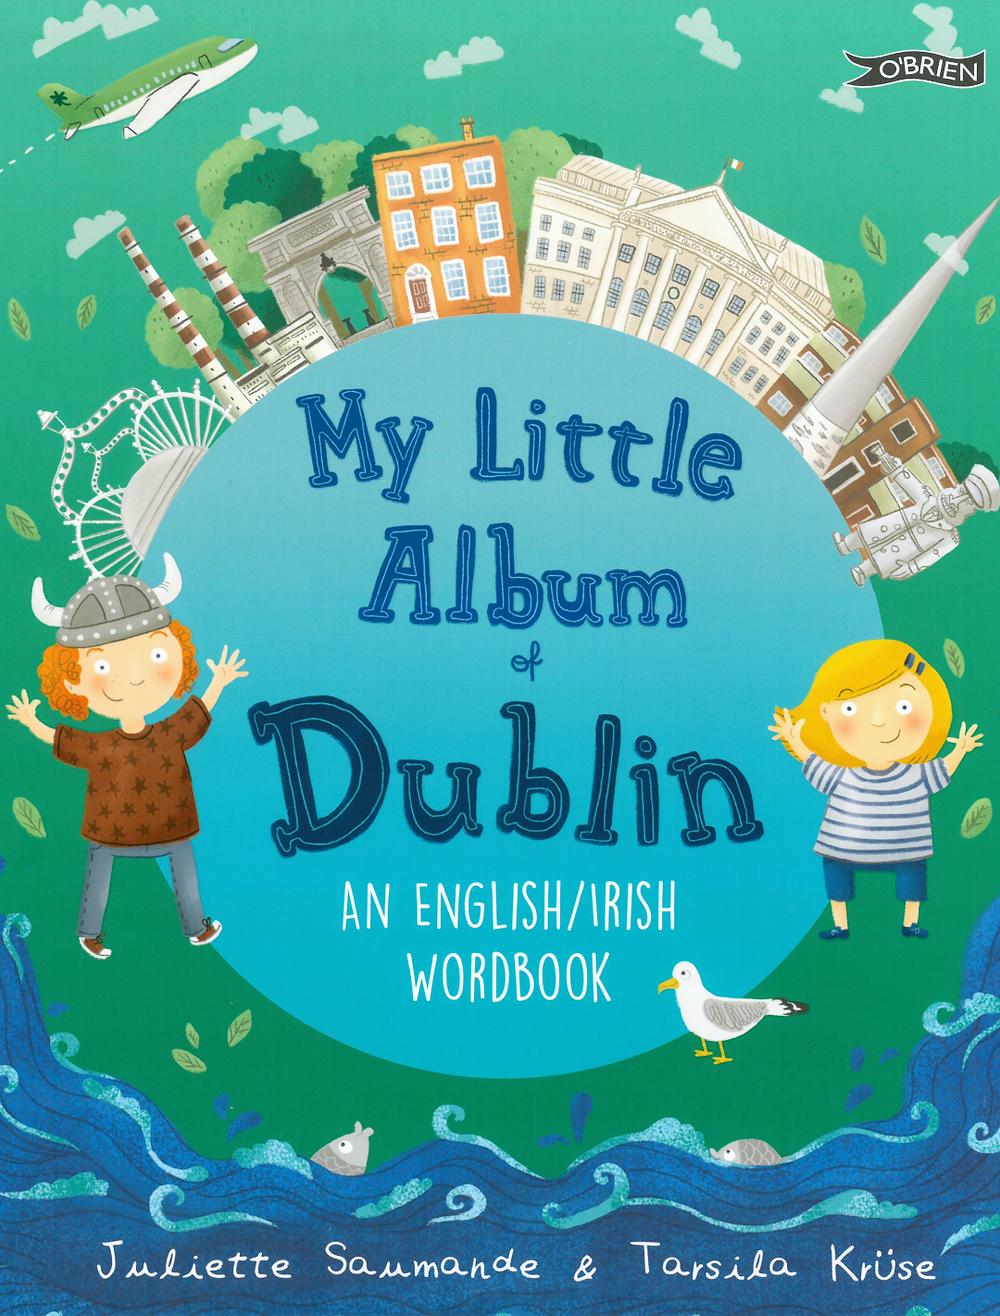 My Little Album of Dublin by Juliette Saumande & Tarsila Krüse